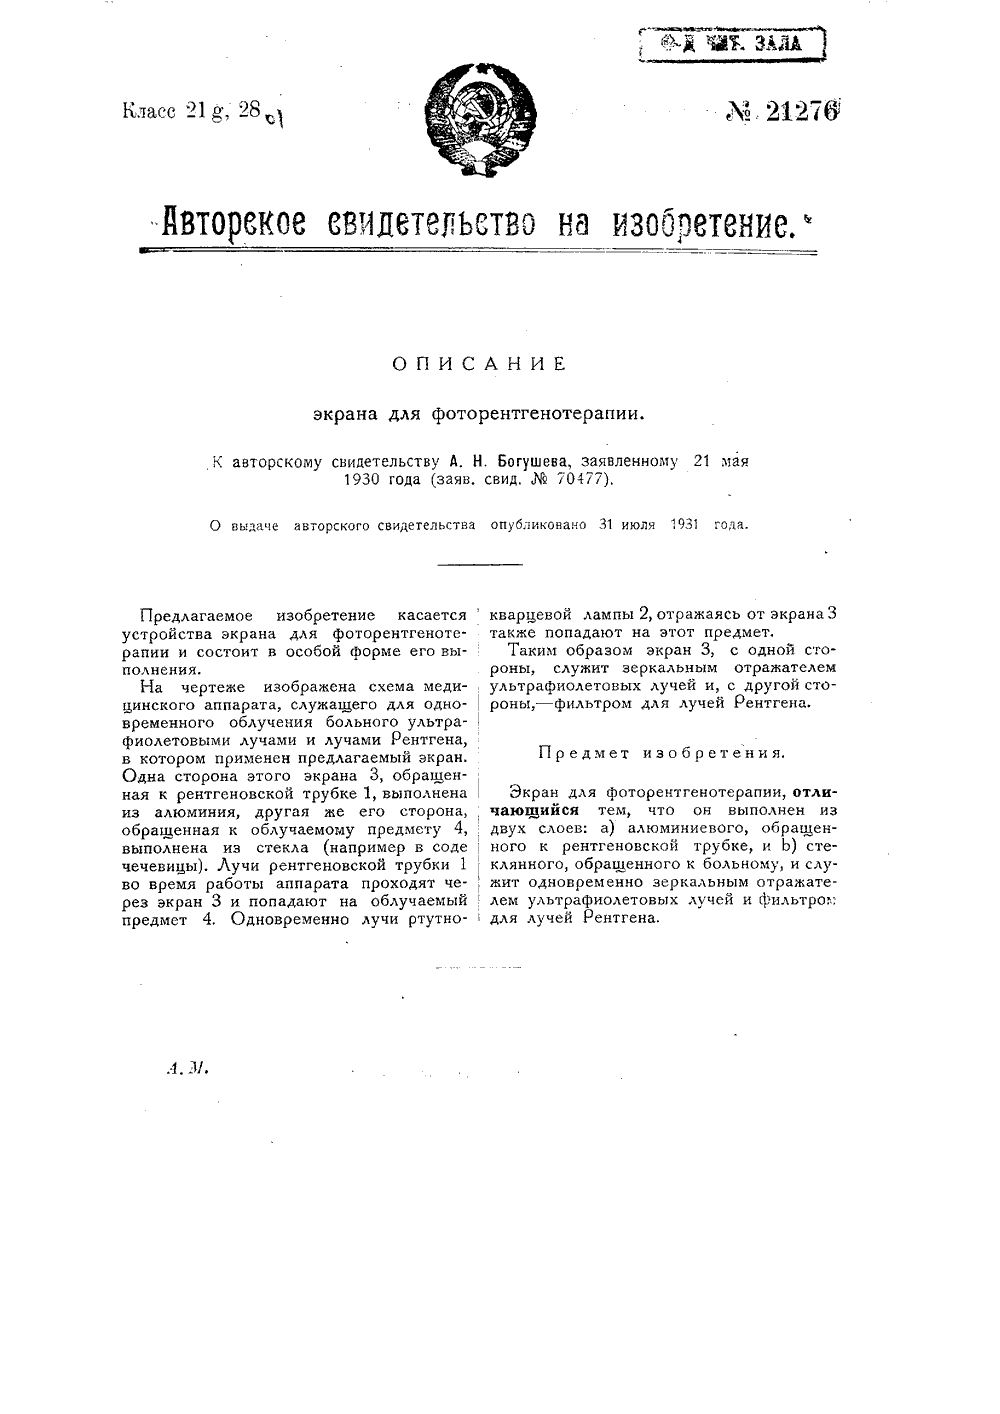 Рентгенофлюорография